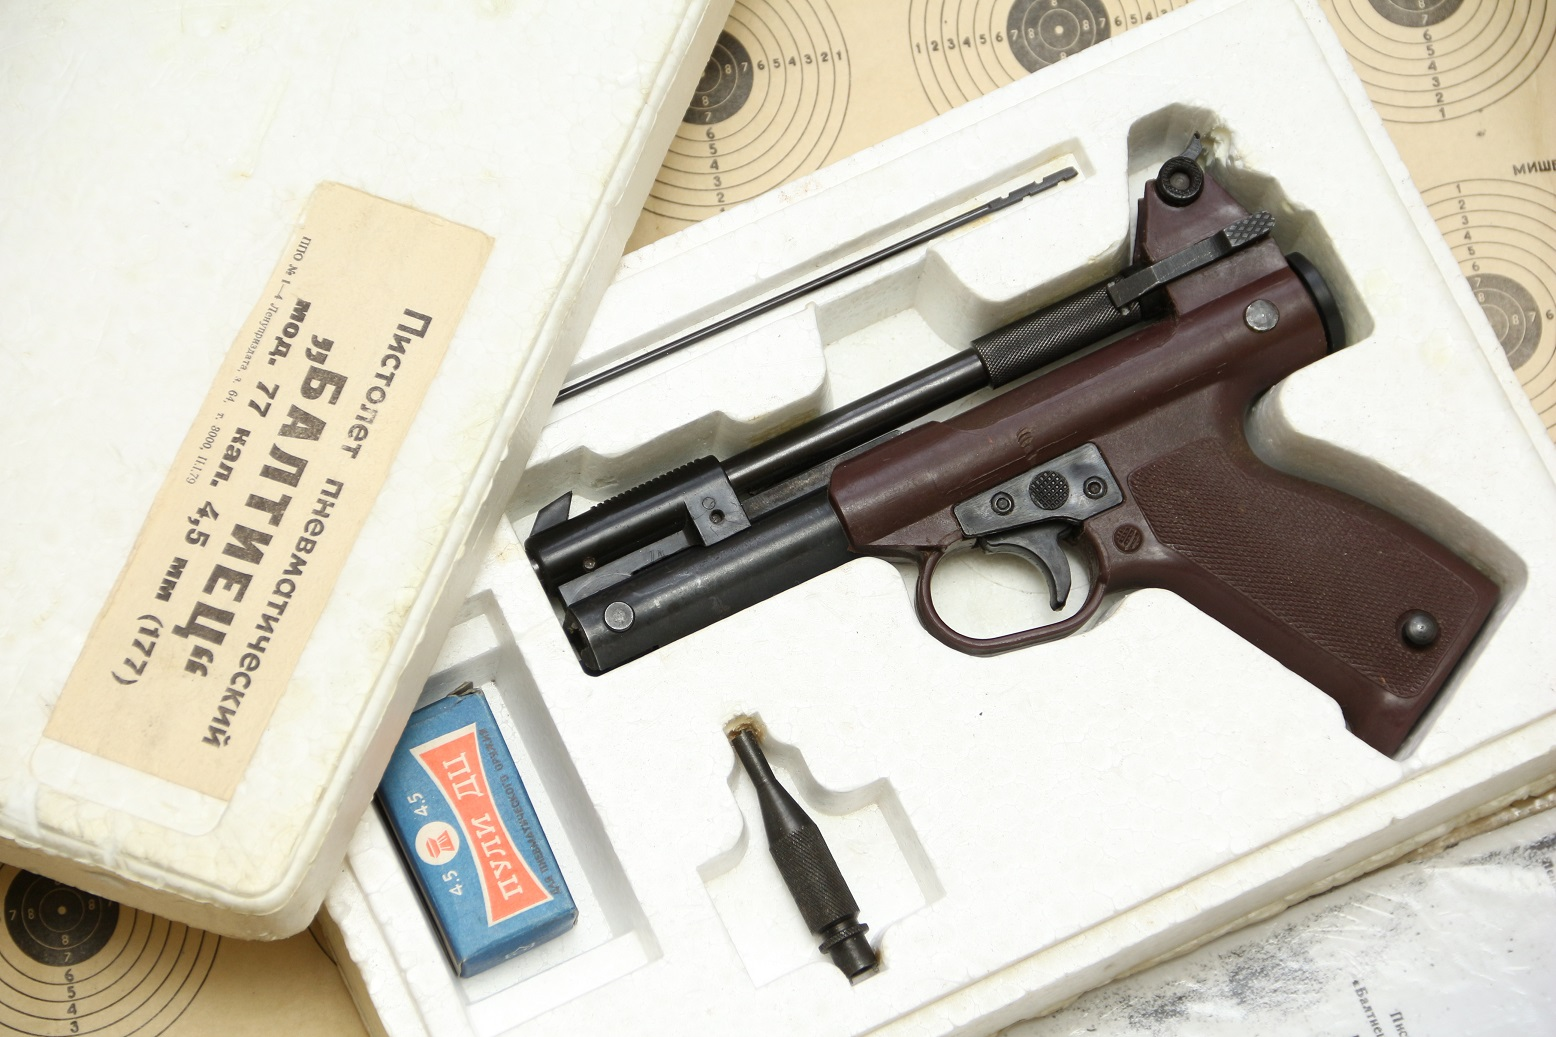 Пневматический пистолет ПП-М. 74 «Балтиец», №ЕО5315, СССР